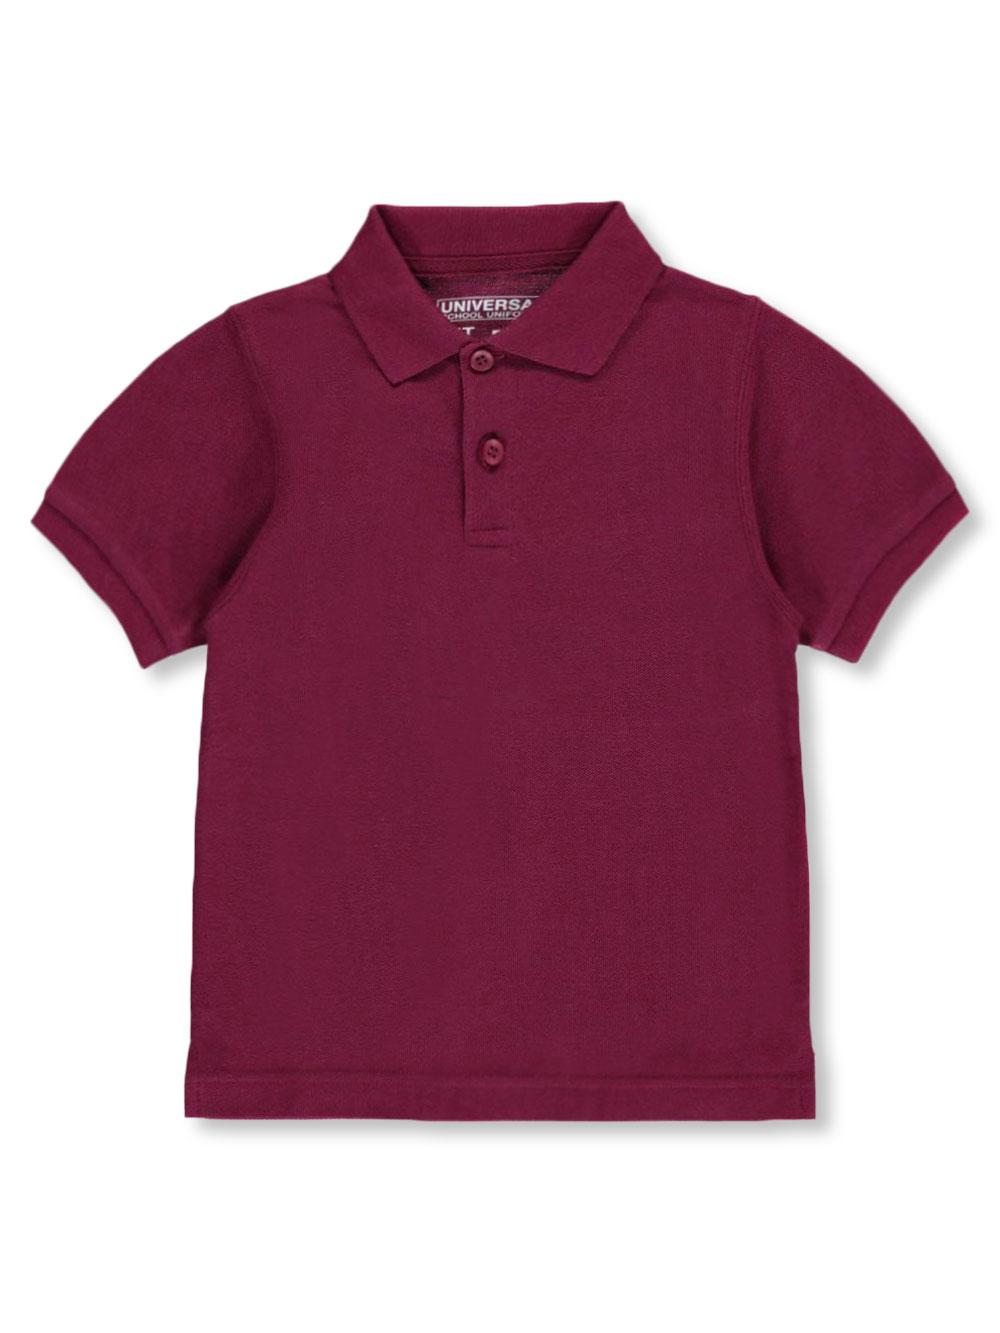 Universal School Uniforms Unisex Boys Girls Short Sleeve Pique Polo Shirt w/Stain Release (2T-20) by Univ- Sku:Staniu838BUR2T; ...